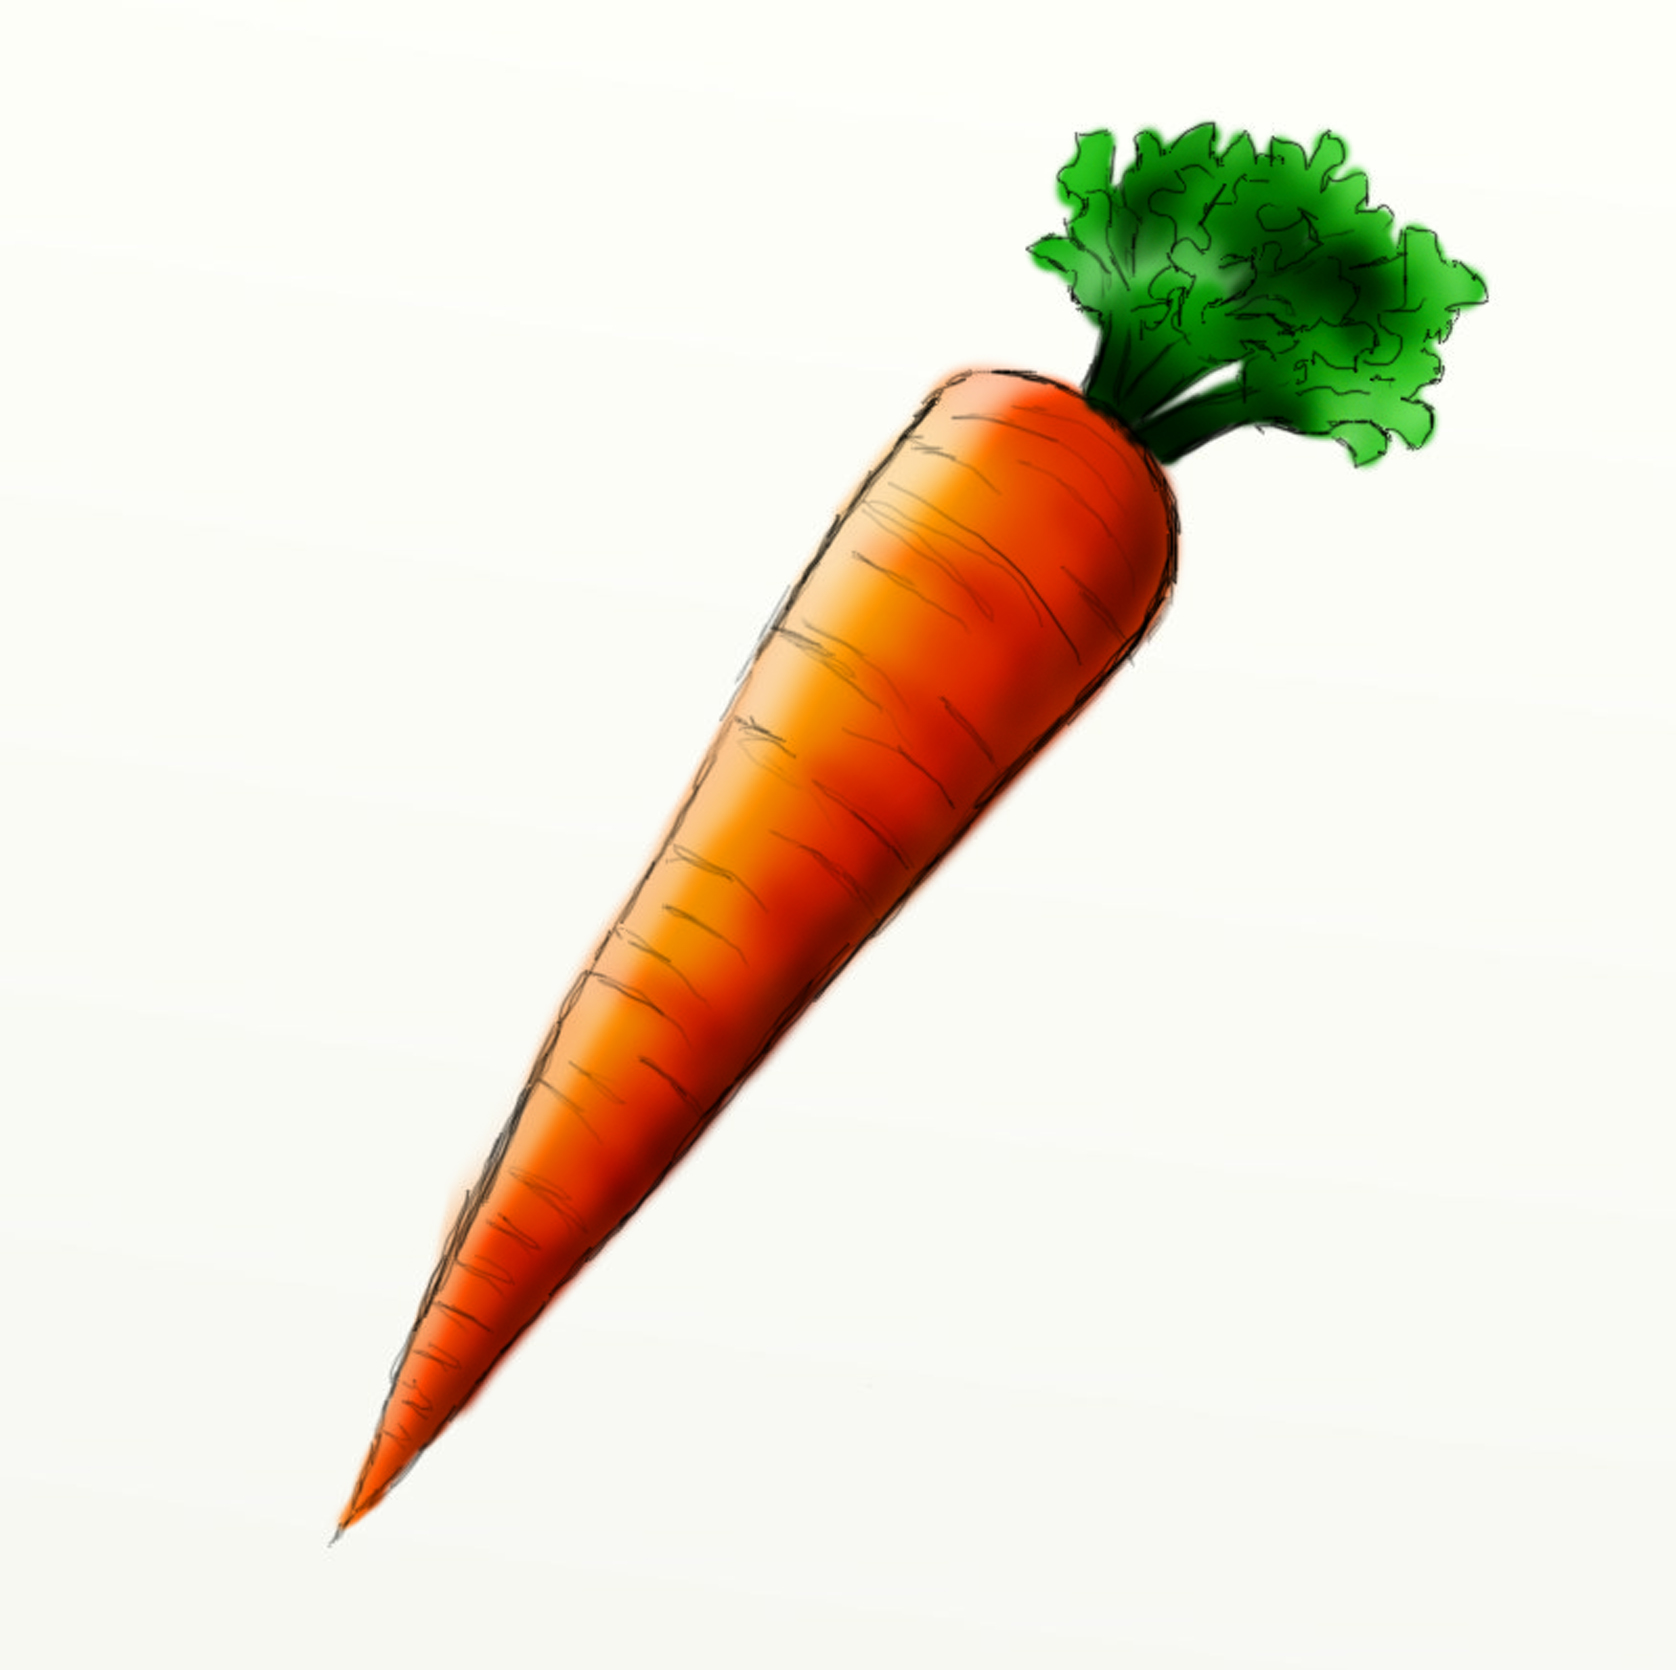 Carrots clip art panda. Carrot clipart christmas